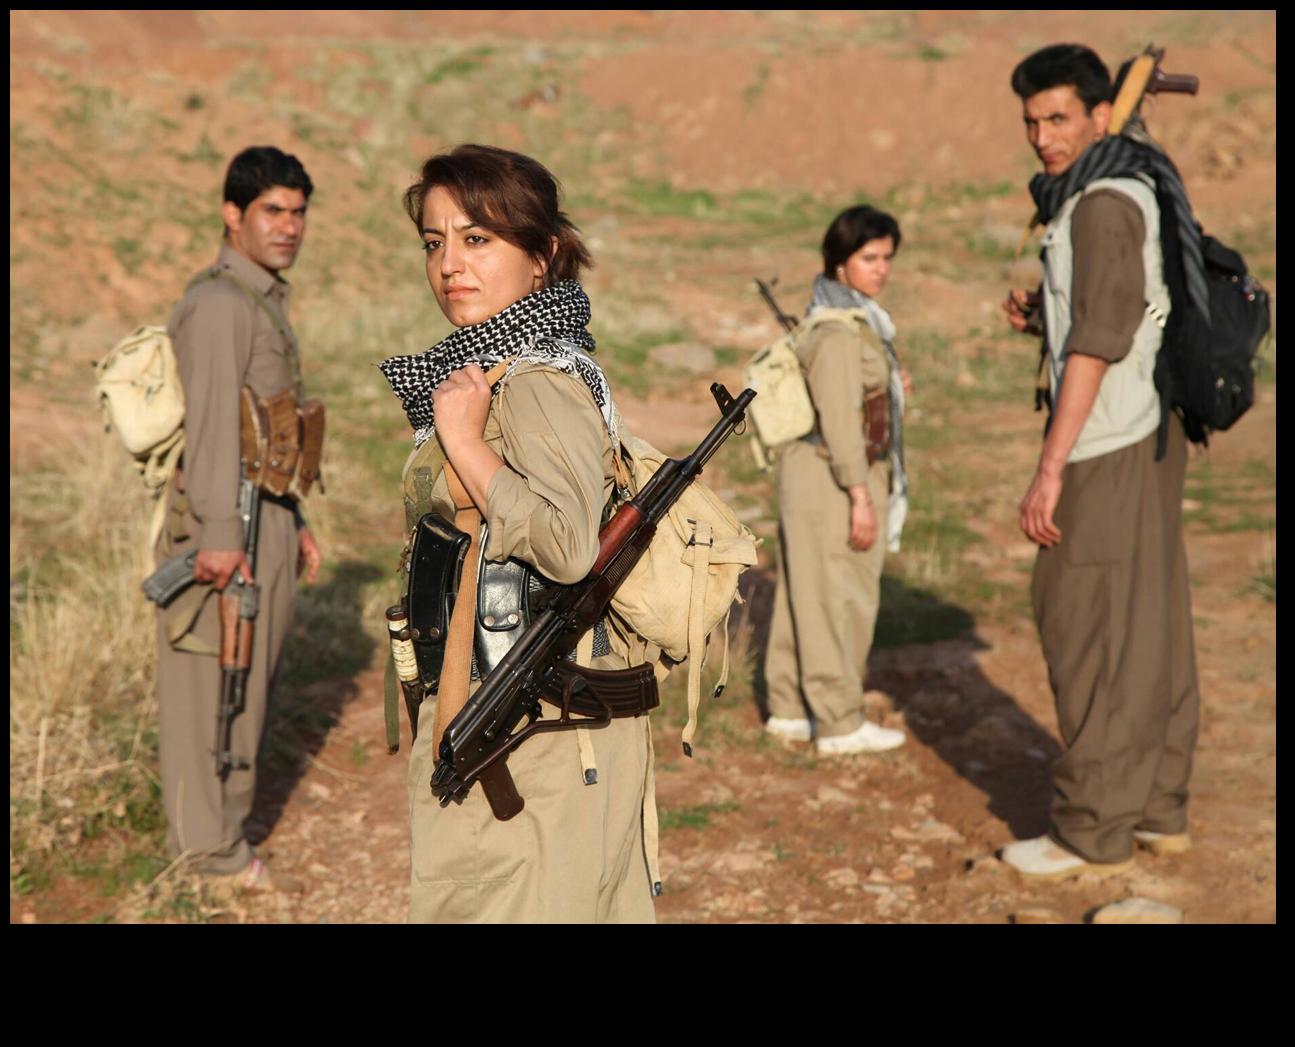 Female PDKI peshmerga